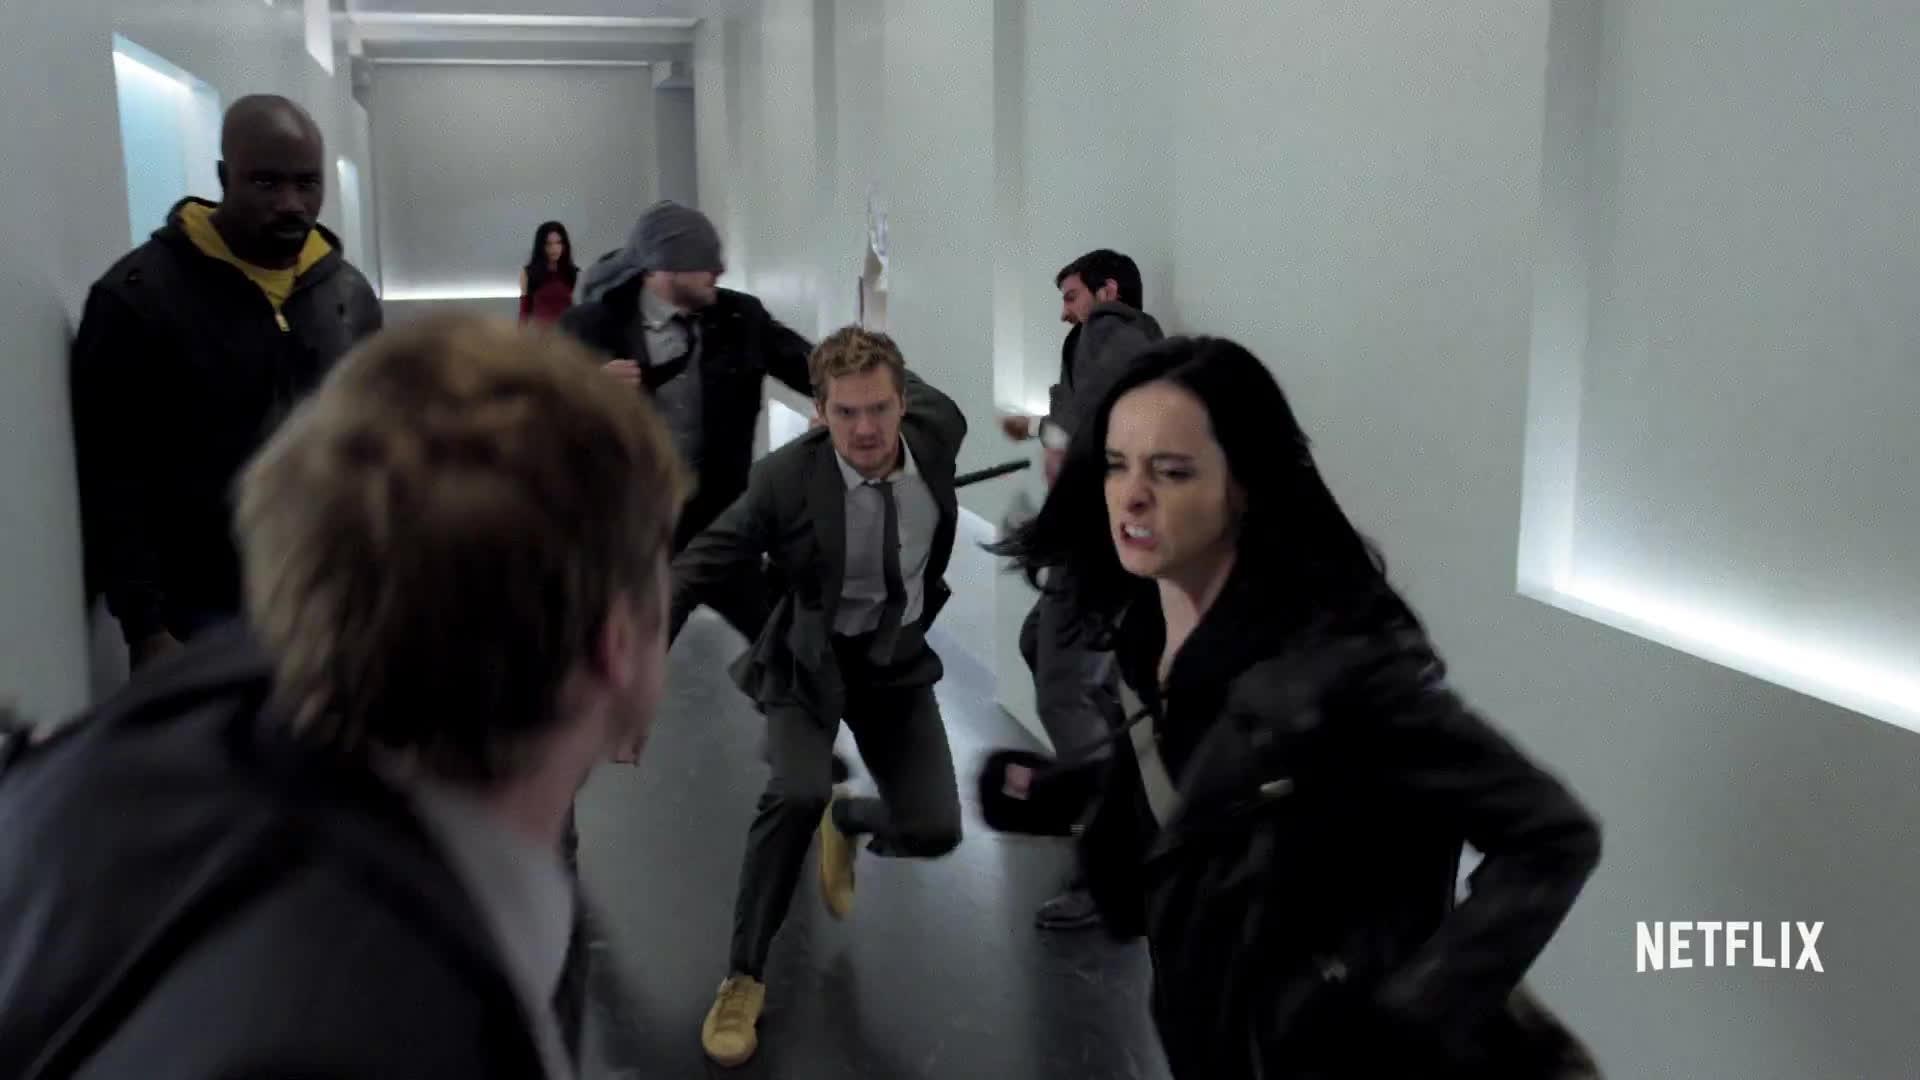 defenders, iron fist, jessica jones, luke cage, netflix, netflix original series, trailer, Marvel's The Defenders | Official Trailer | Netflix [HD] GIFs